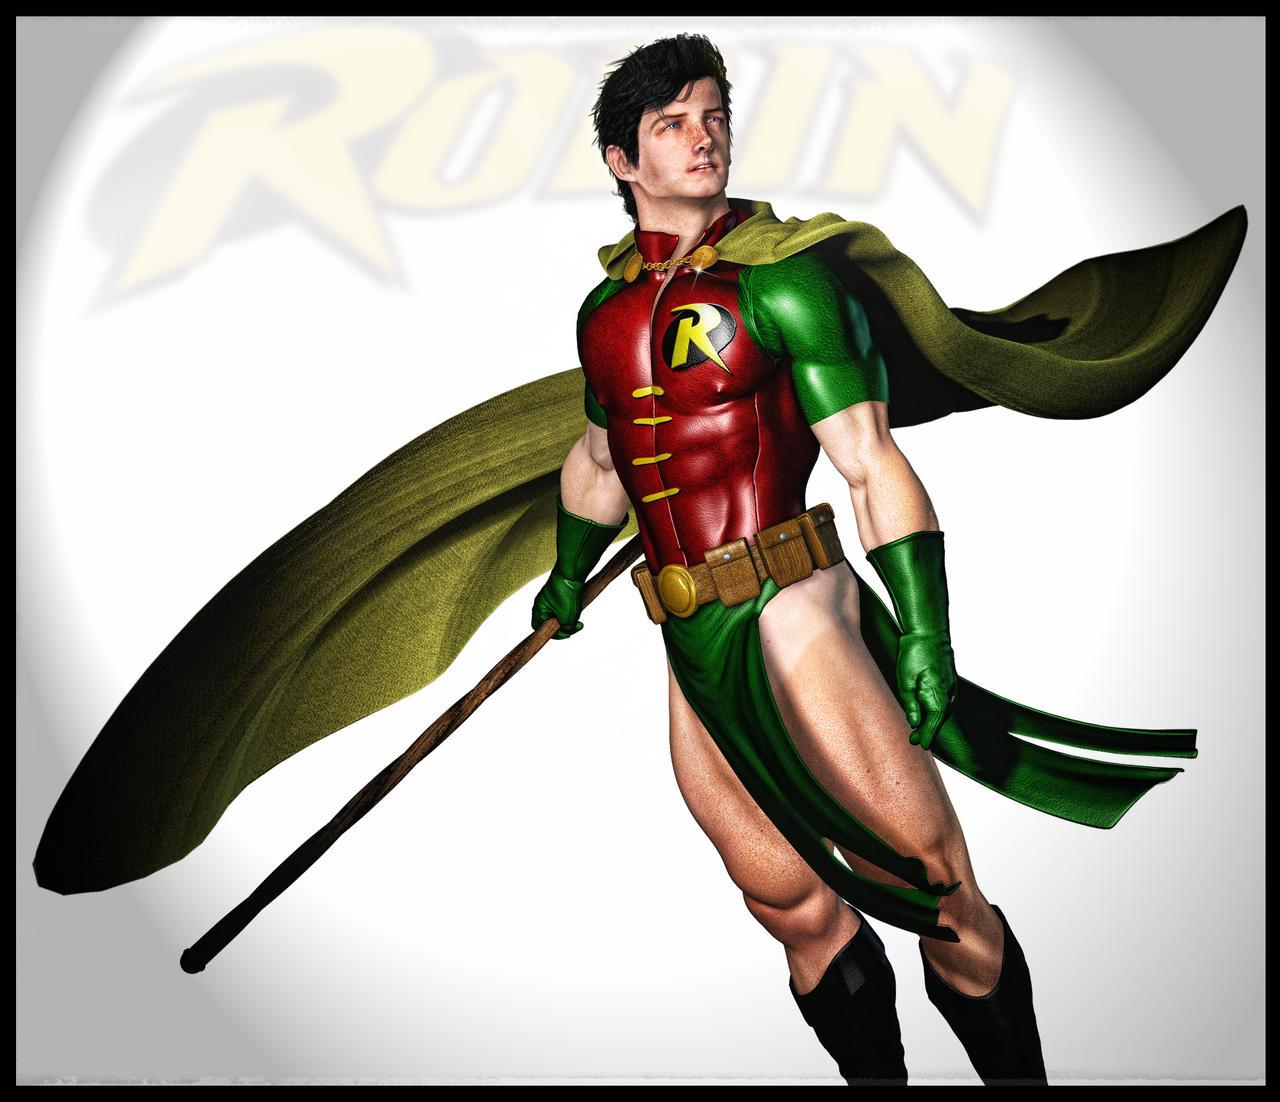 Robin - Boy Wonder by Biako06